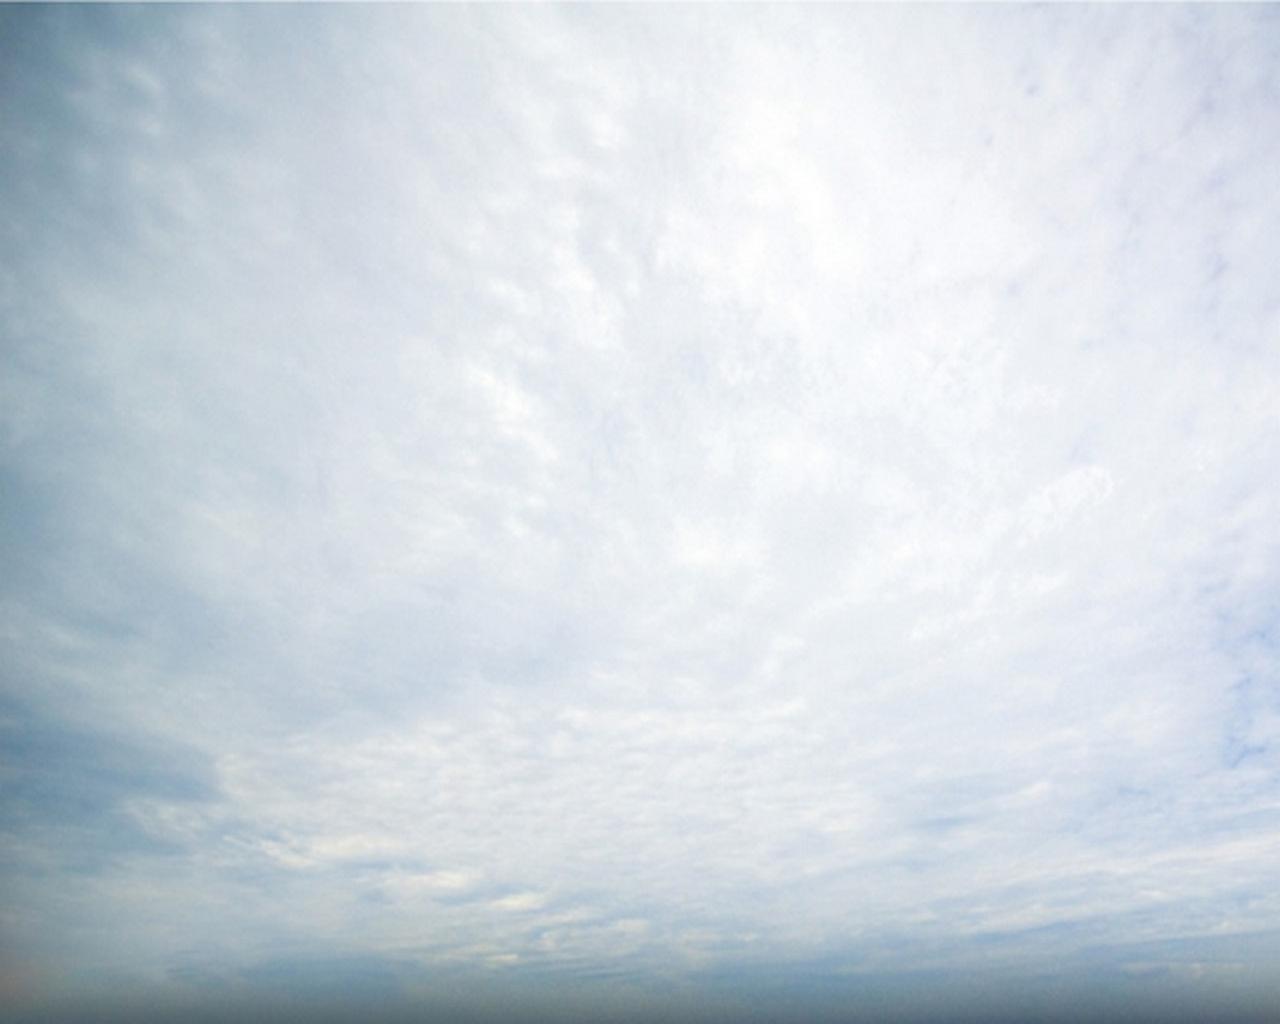 Background Album | Background Desktops Pics